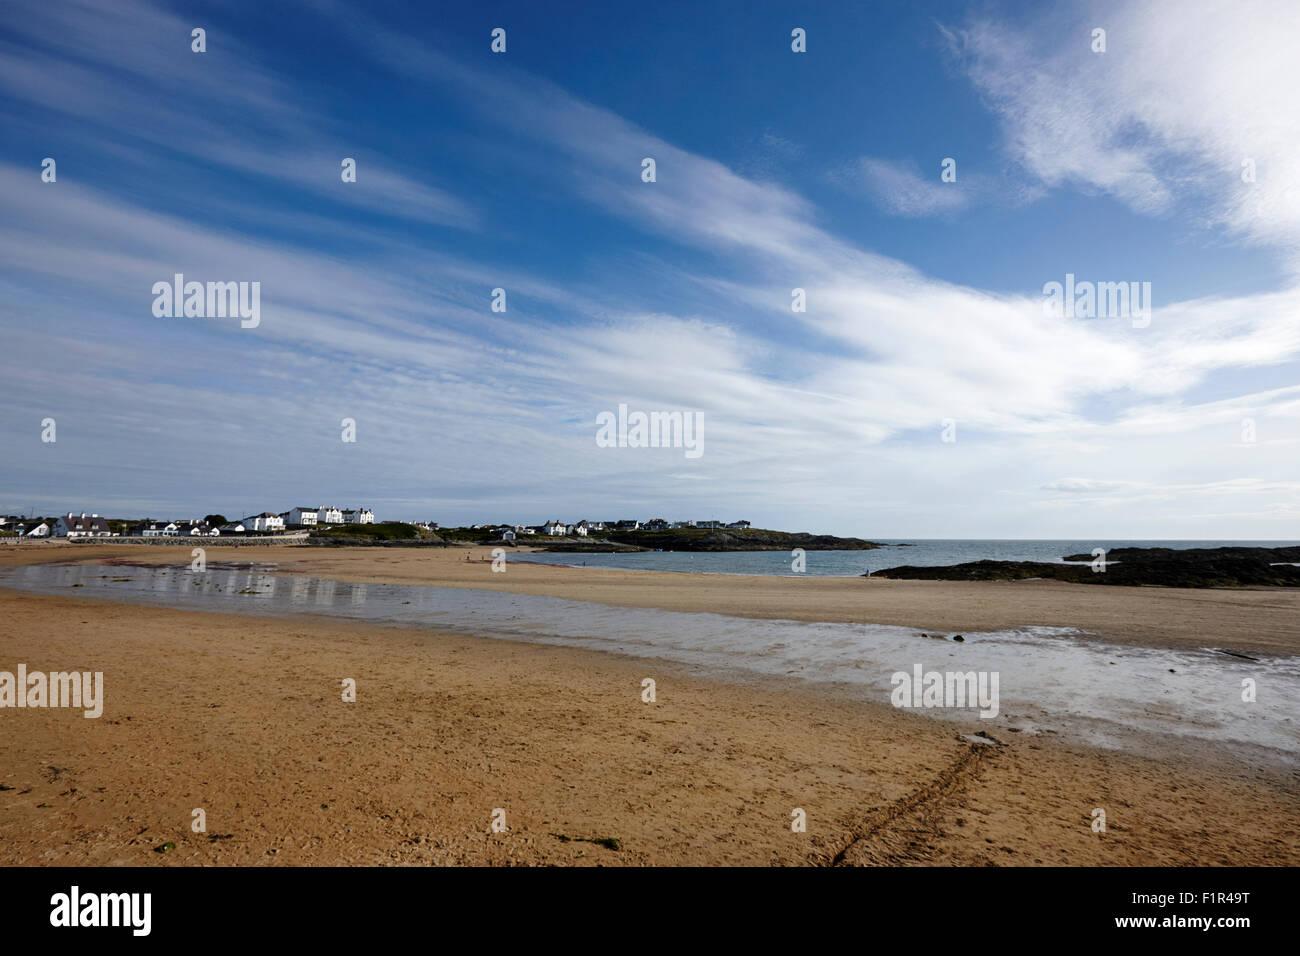 trearddur bay village beach north wales uk - Stock Image